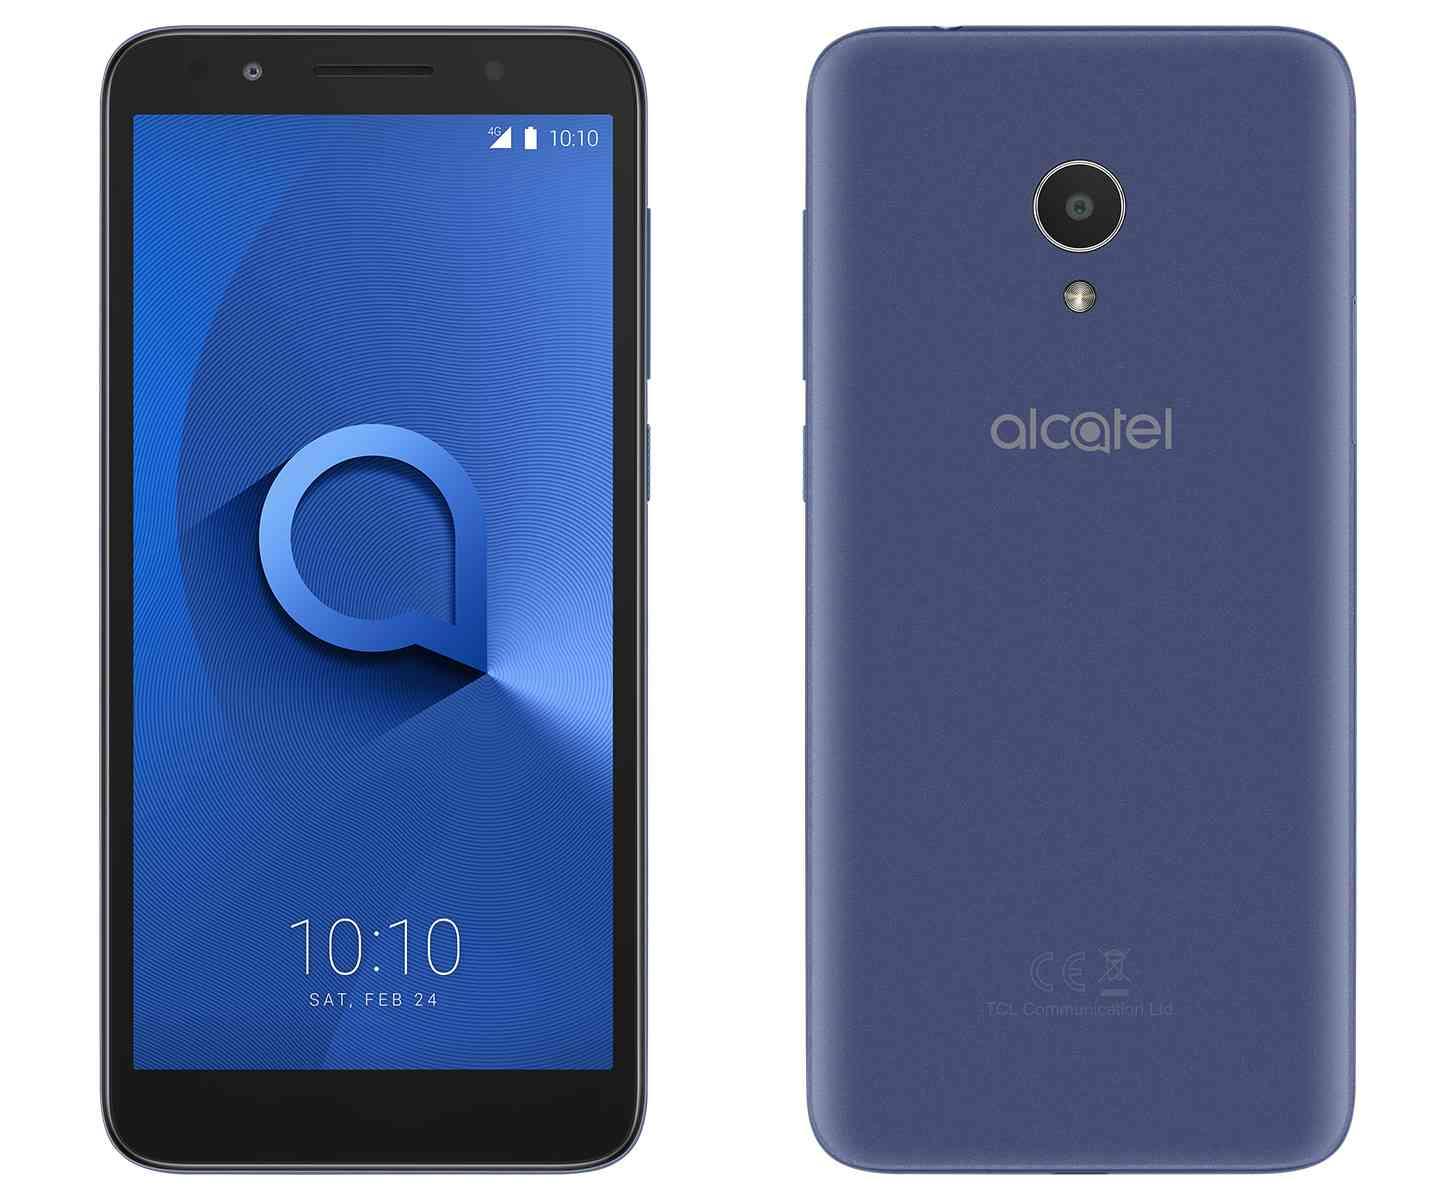 Alcatel 1X Android Go phone